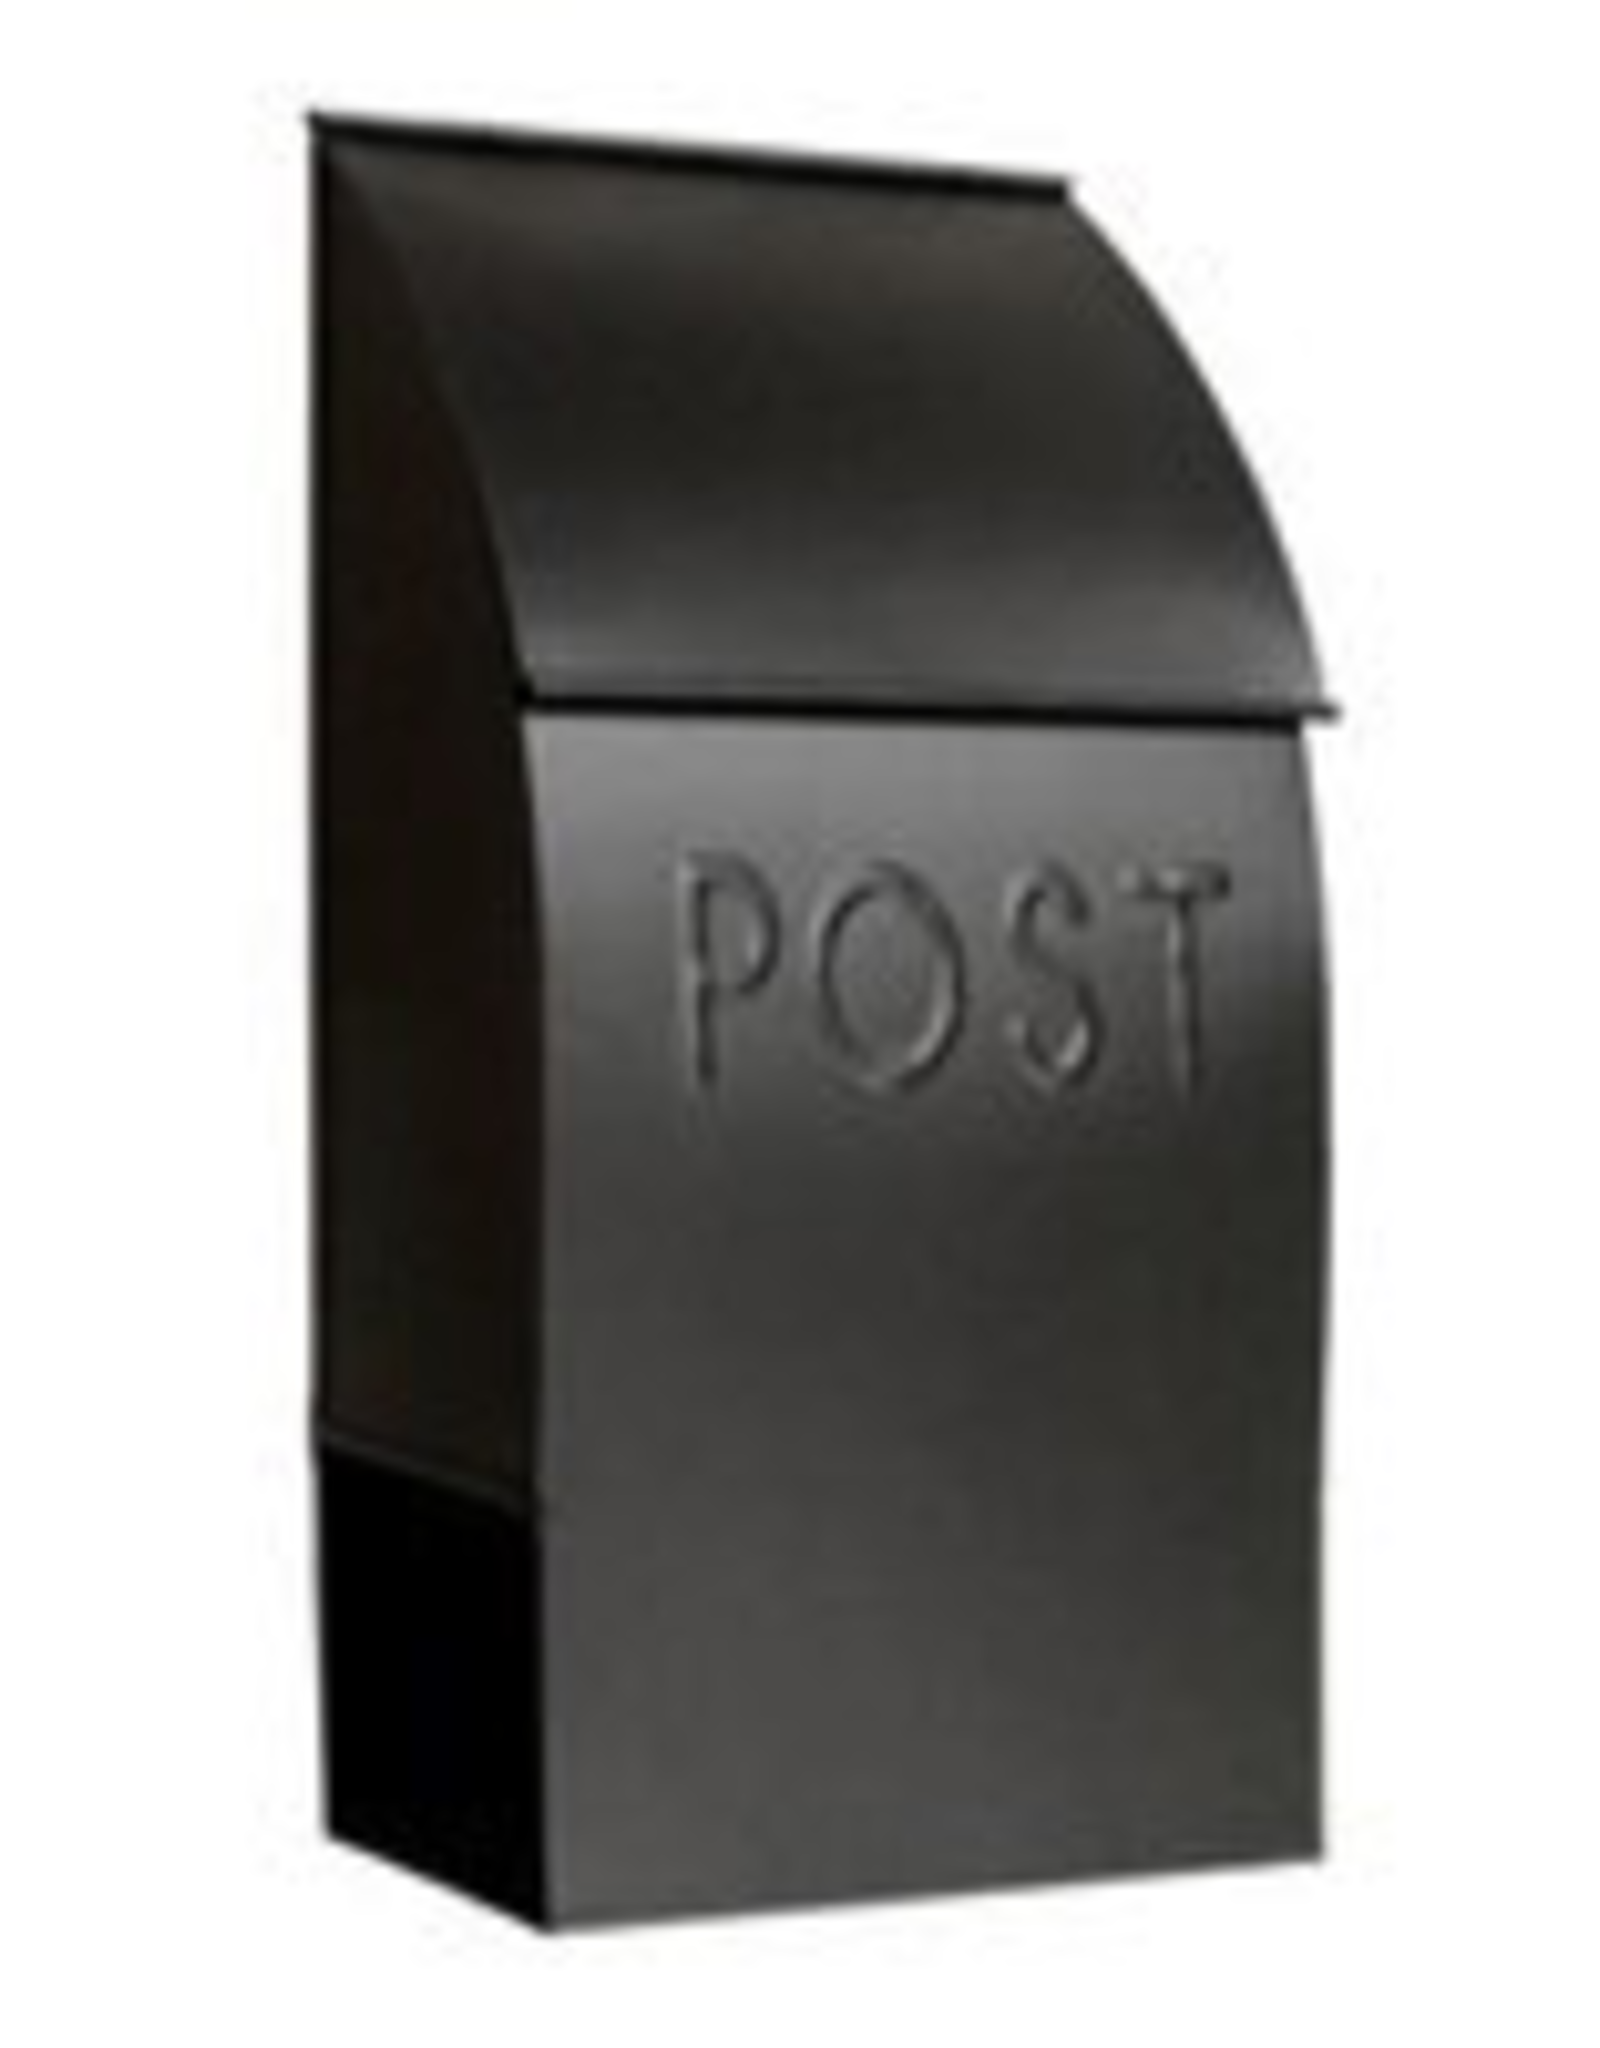 Black Milano Pointed Mailbox